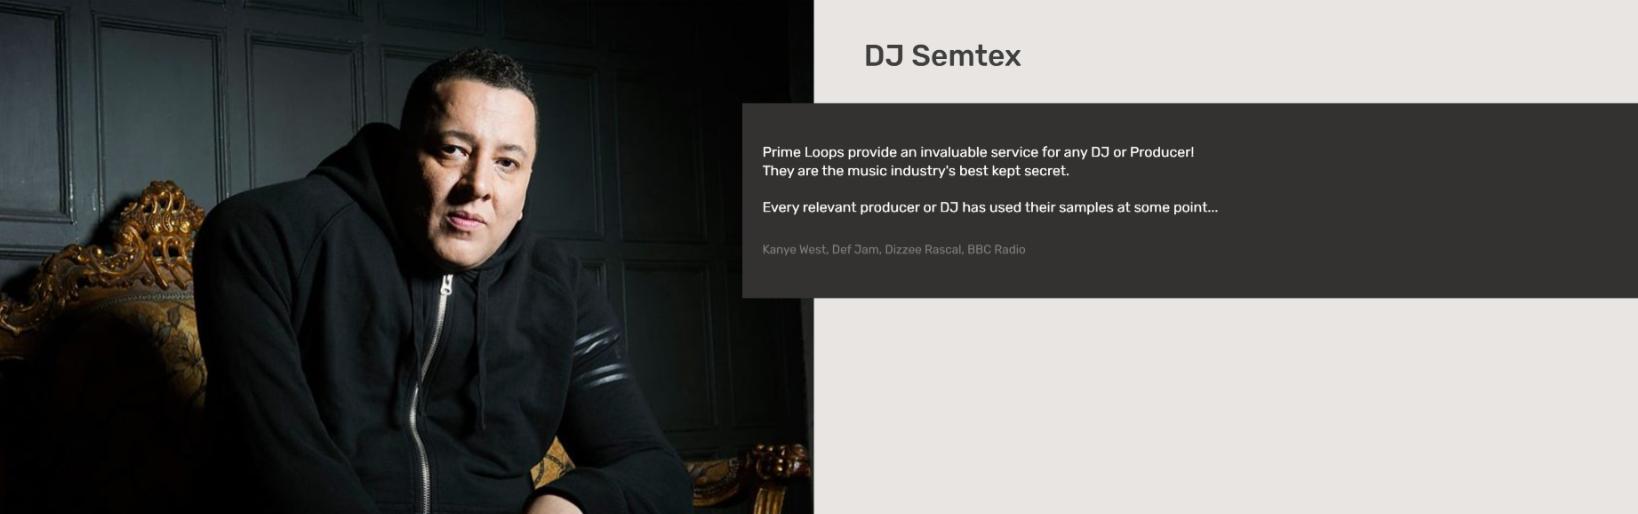 DJ Semtex   Testimonial